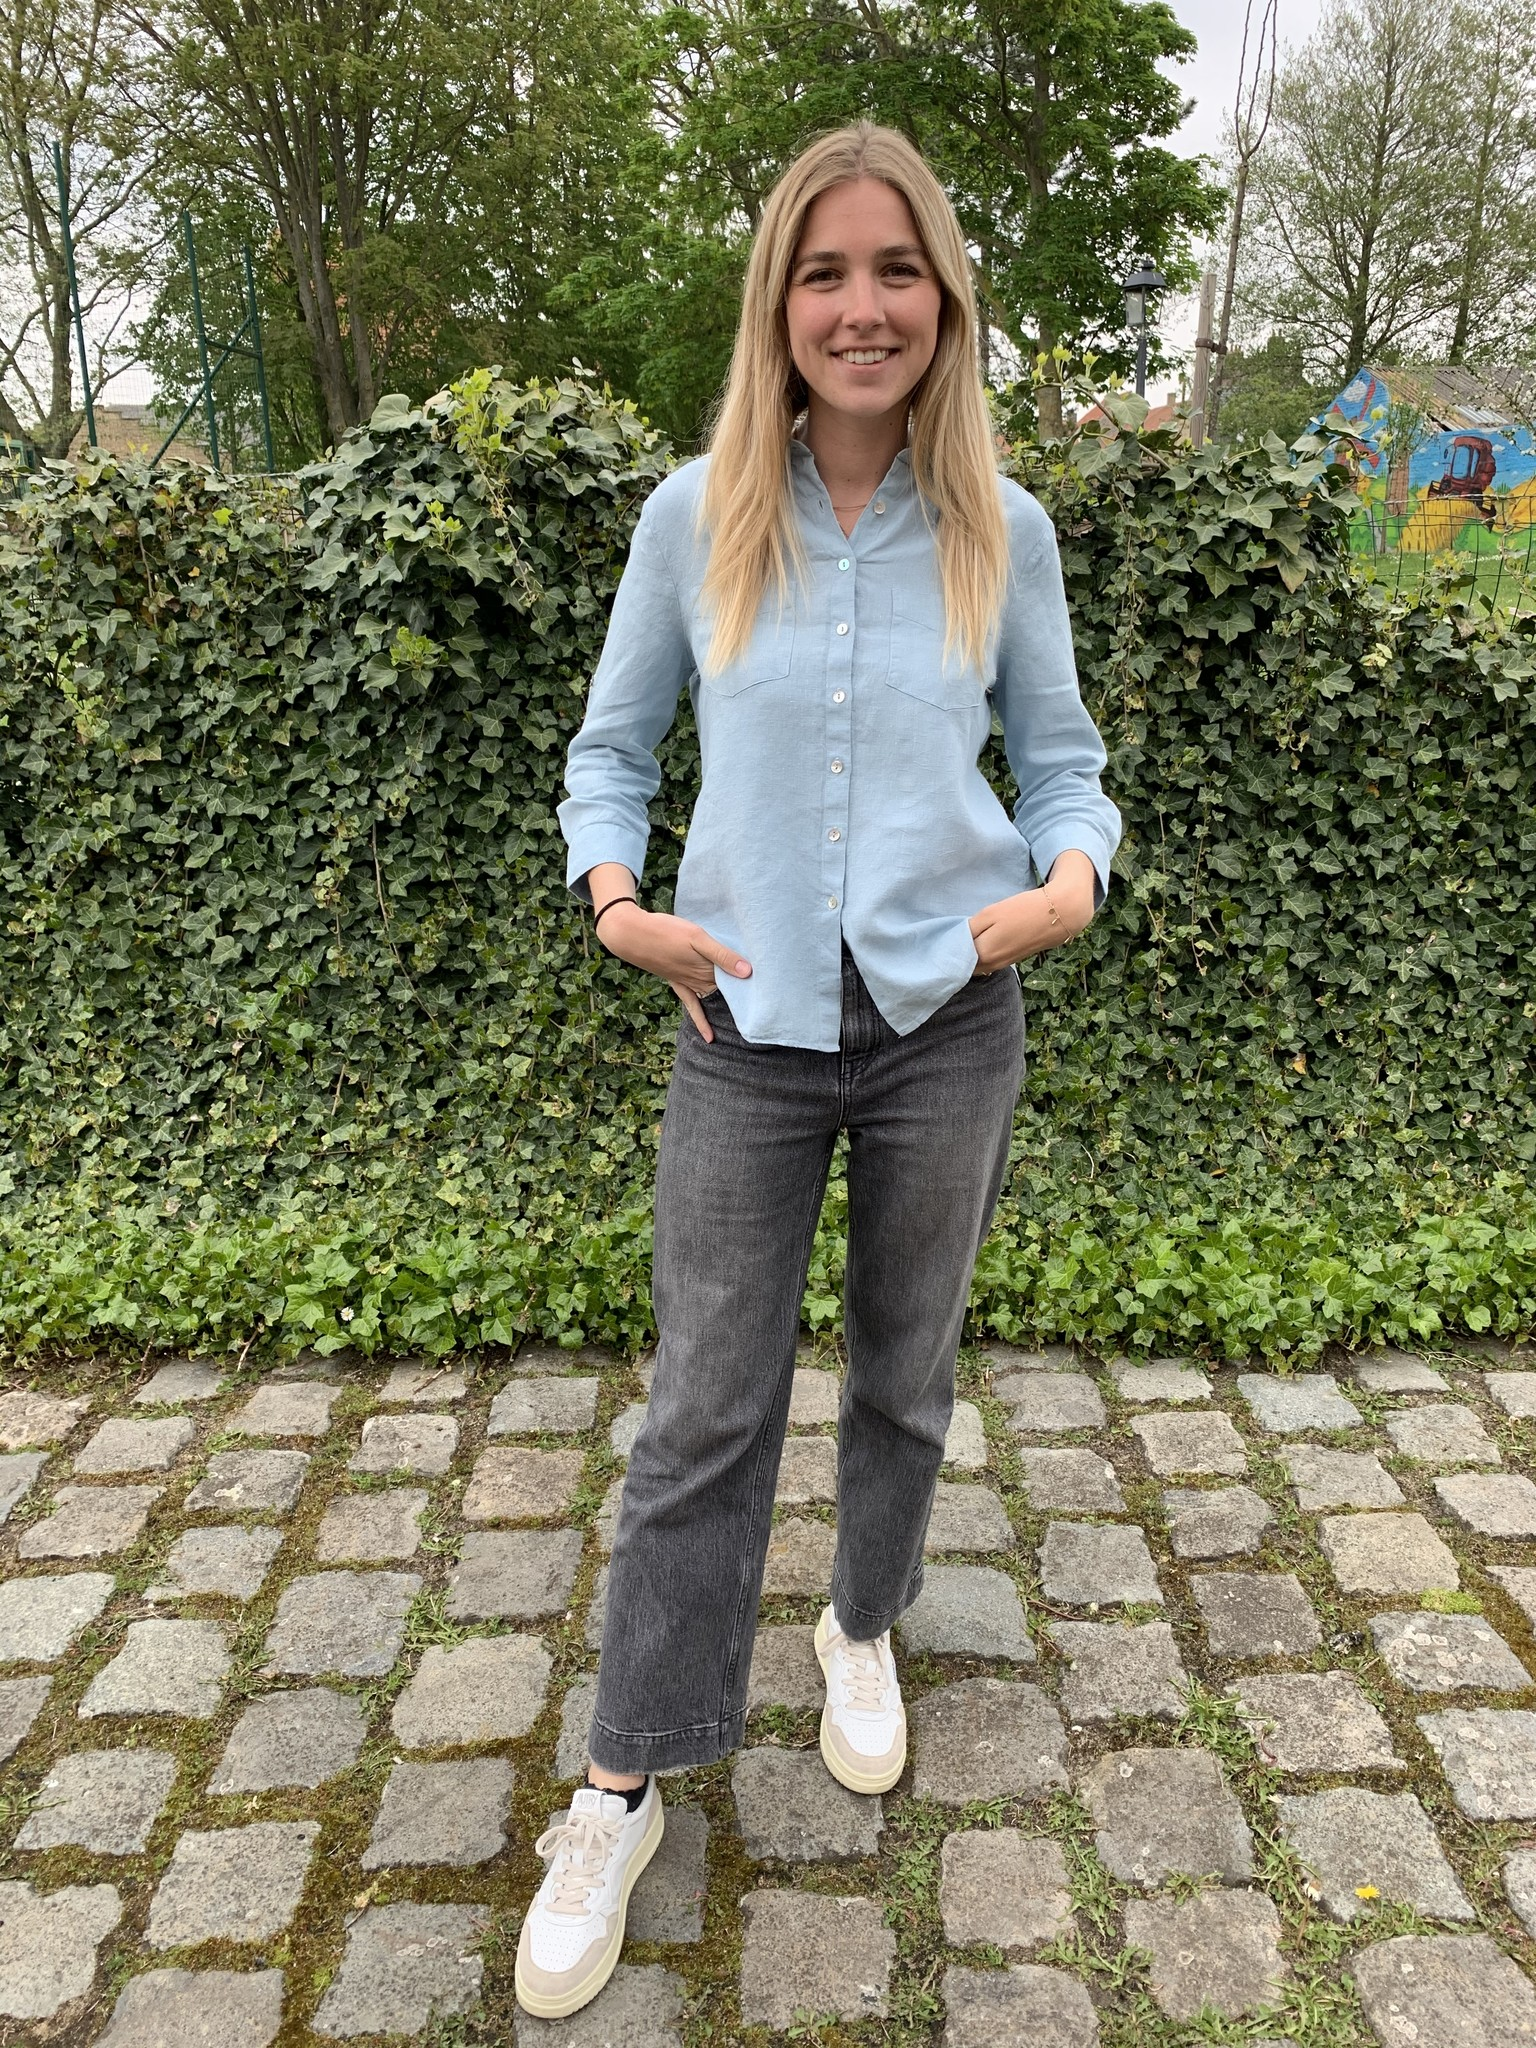 Le grenier du lin 3/4 mouwen lichtblauw puur linnen blouse